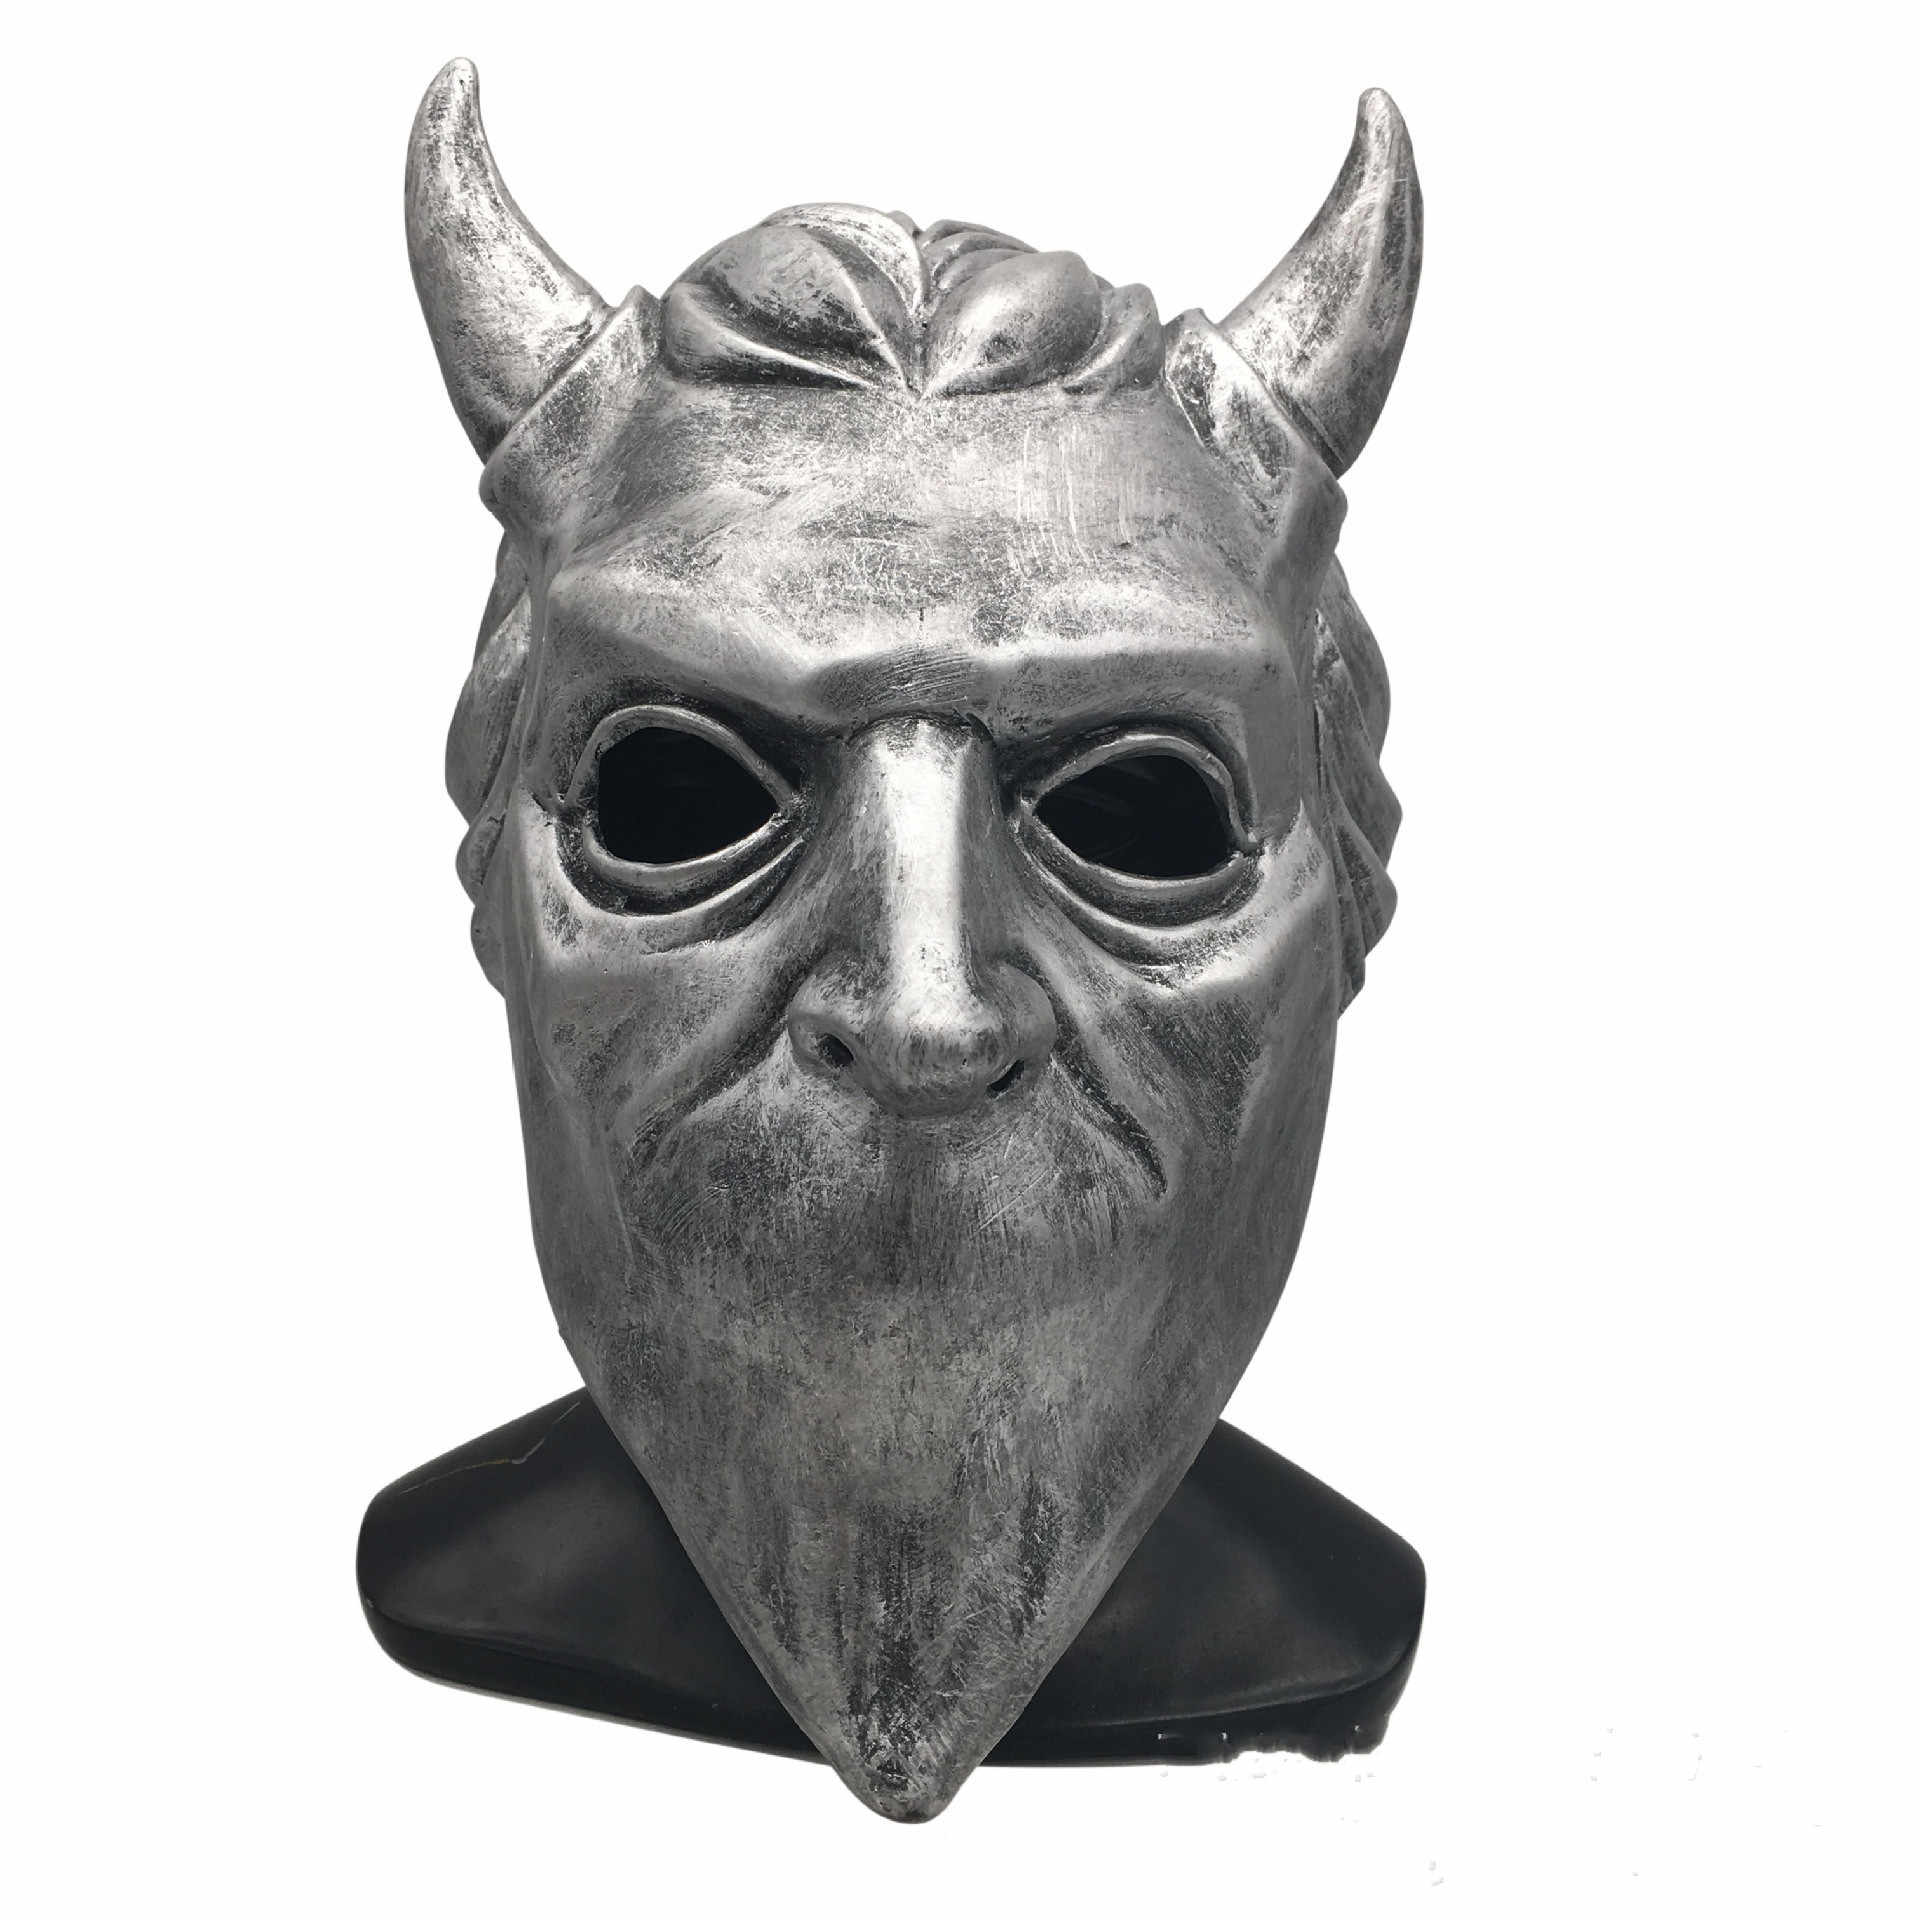 Slipknot Mask /Corey Taylor Cosplay Live TV Slipknot Dj Latex Masks /Halloween Party Props